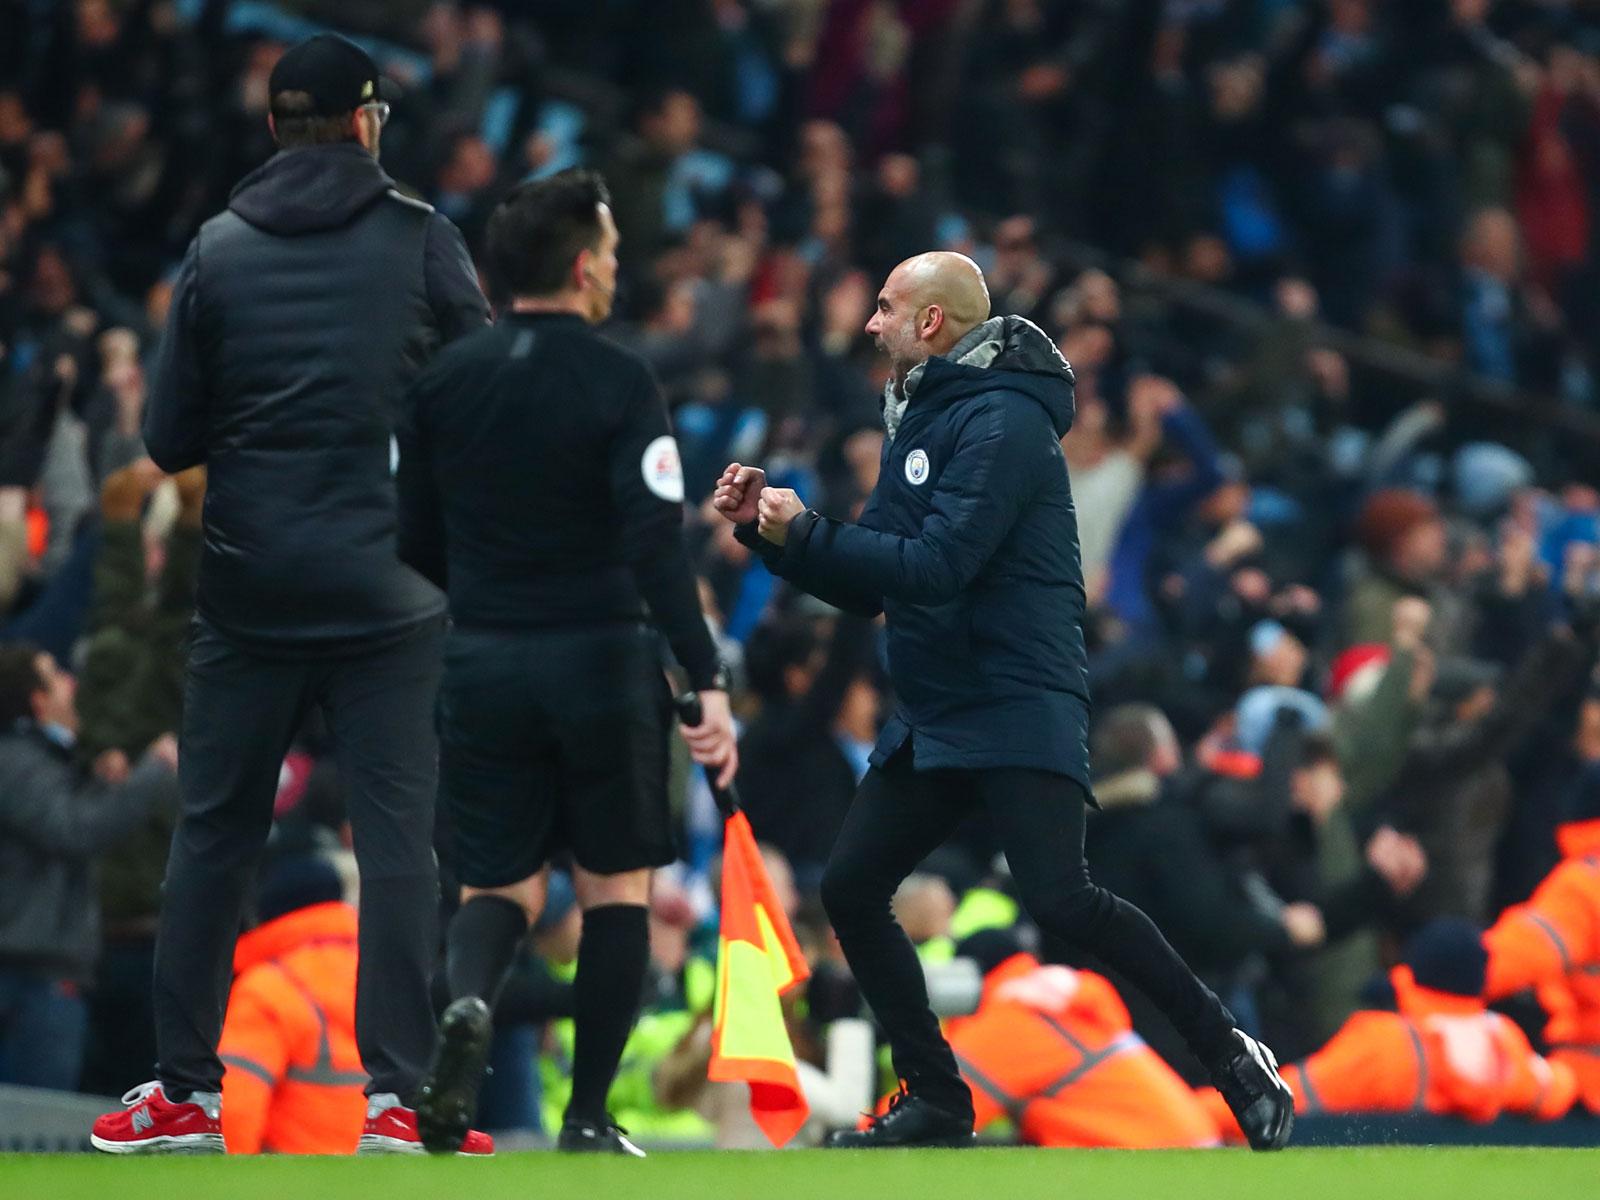 Pep Guardiola celebrates Man City's win over Liverpool